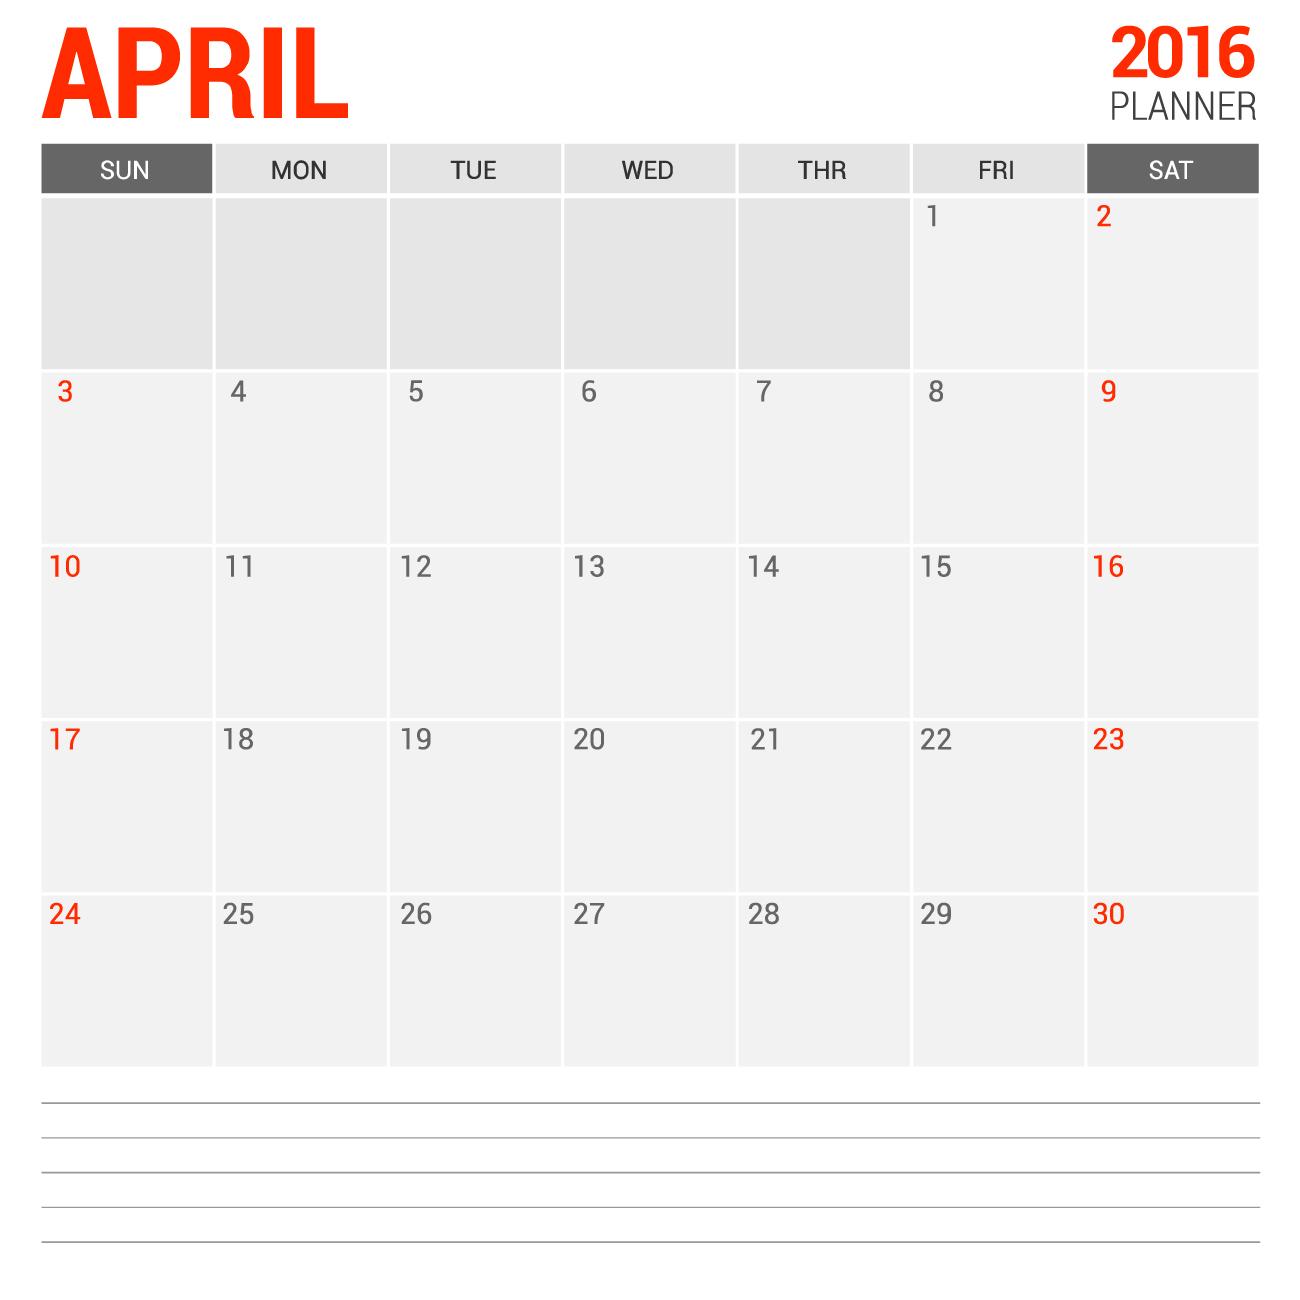 ... calendar template 2016 550 x 425 jpeg 35kb printable weekly calendar